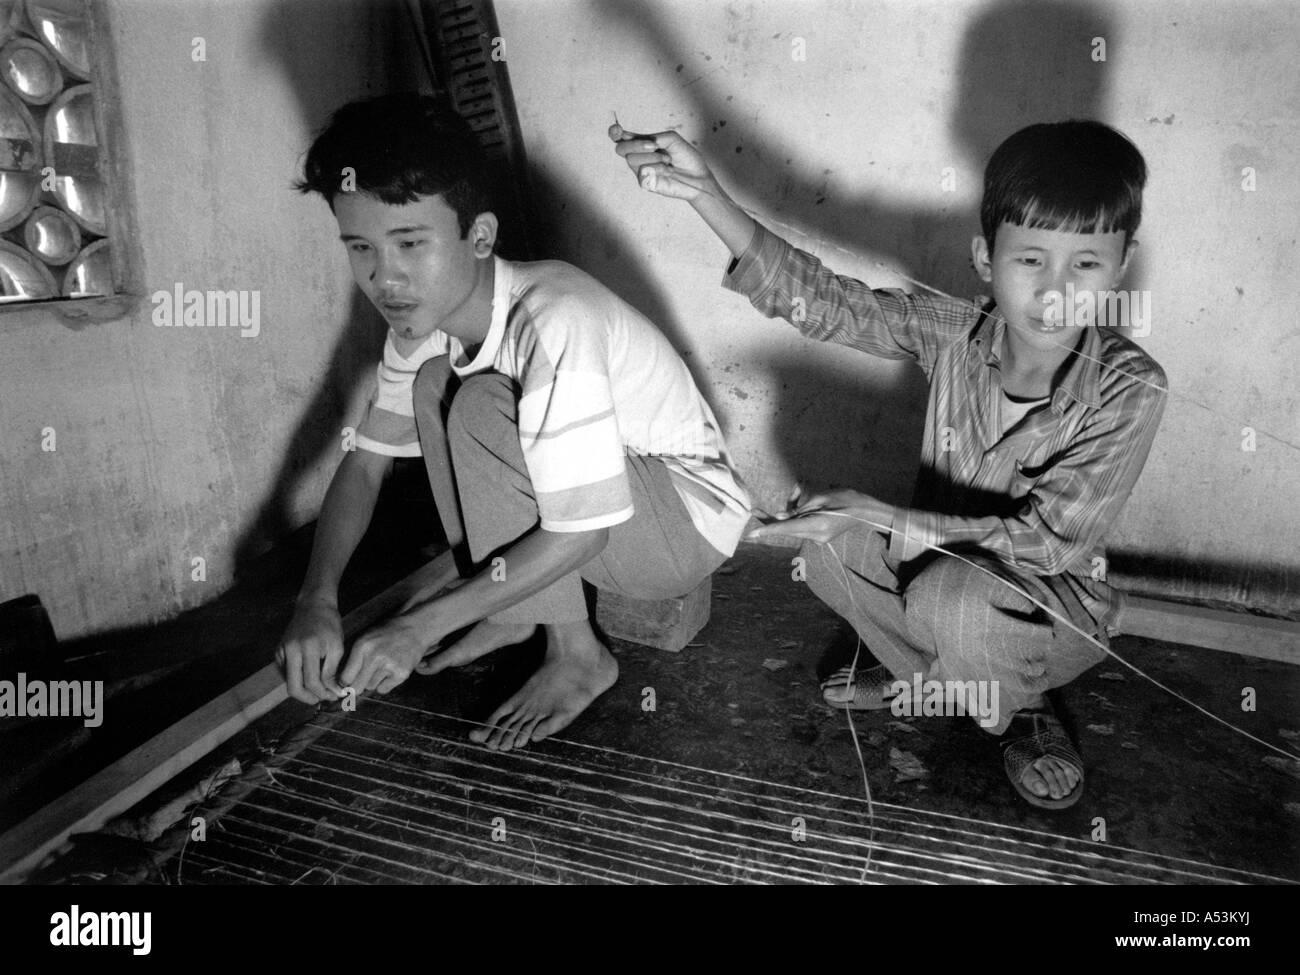 Painet Ha1334 134 Black And White War Blind Boys Making Handicrafts